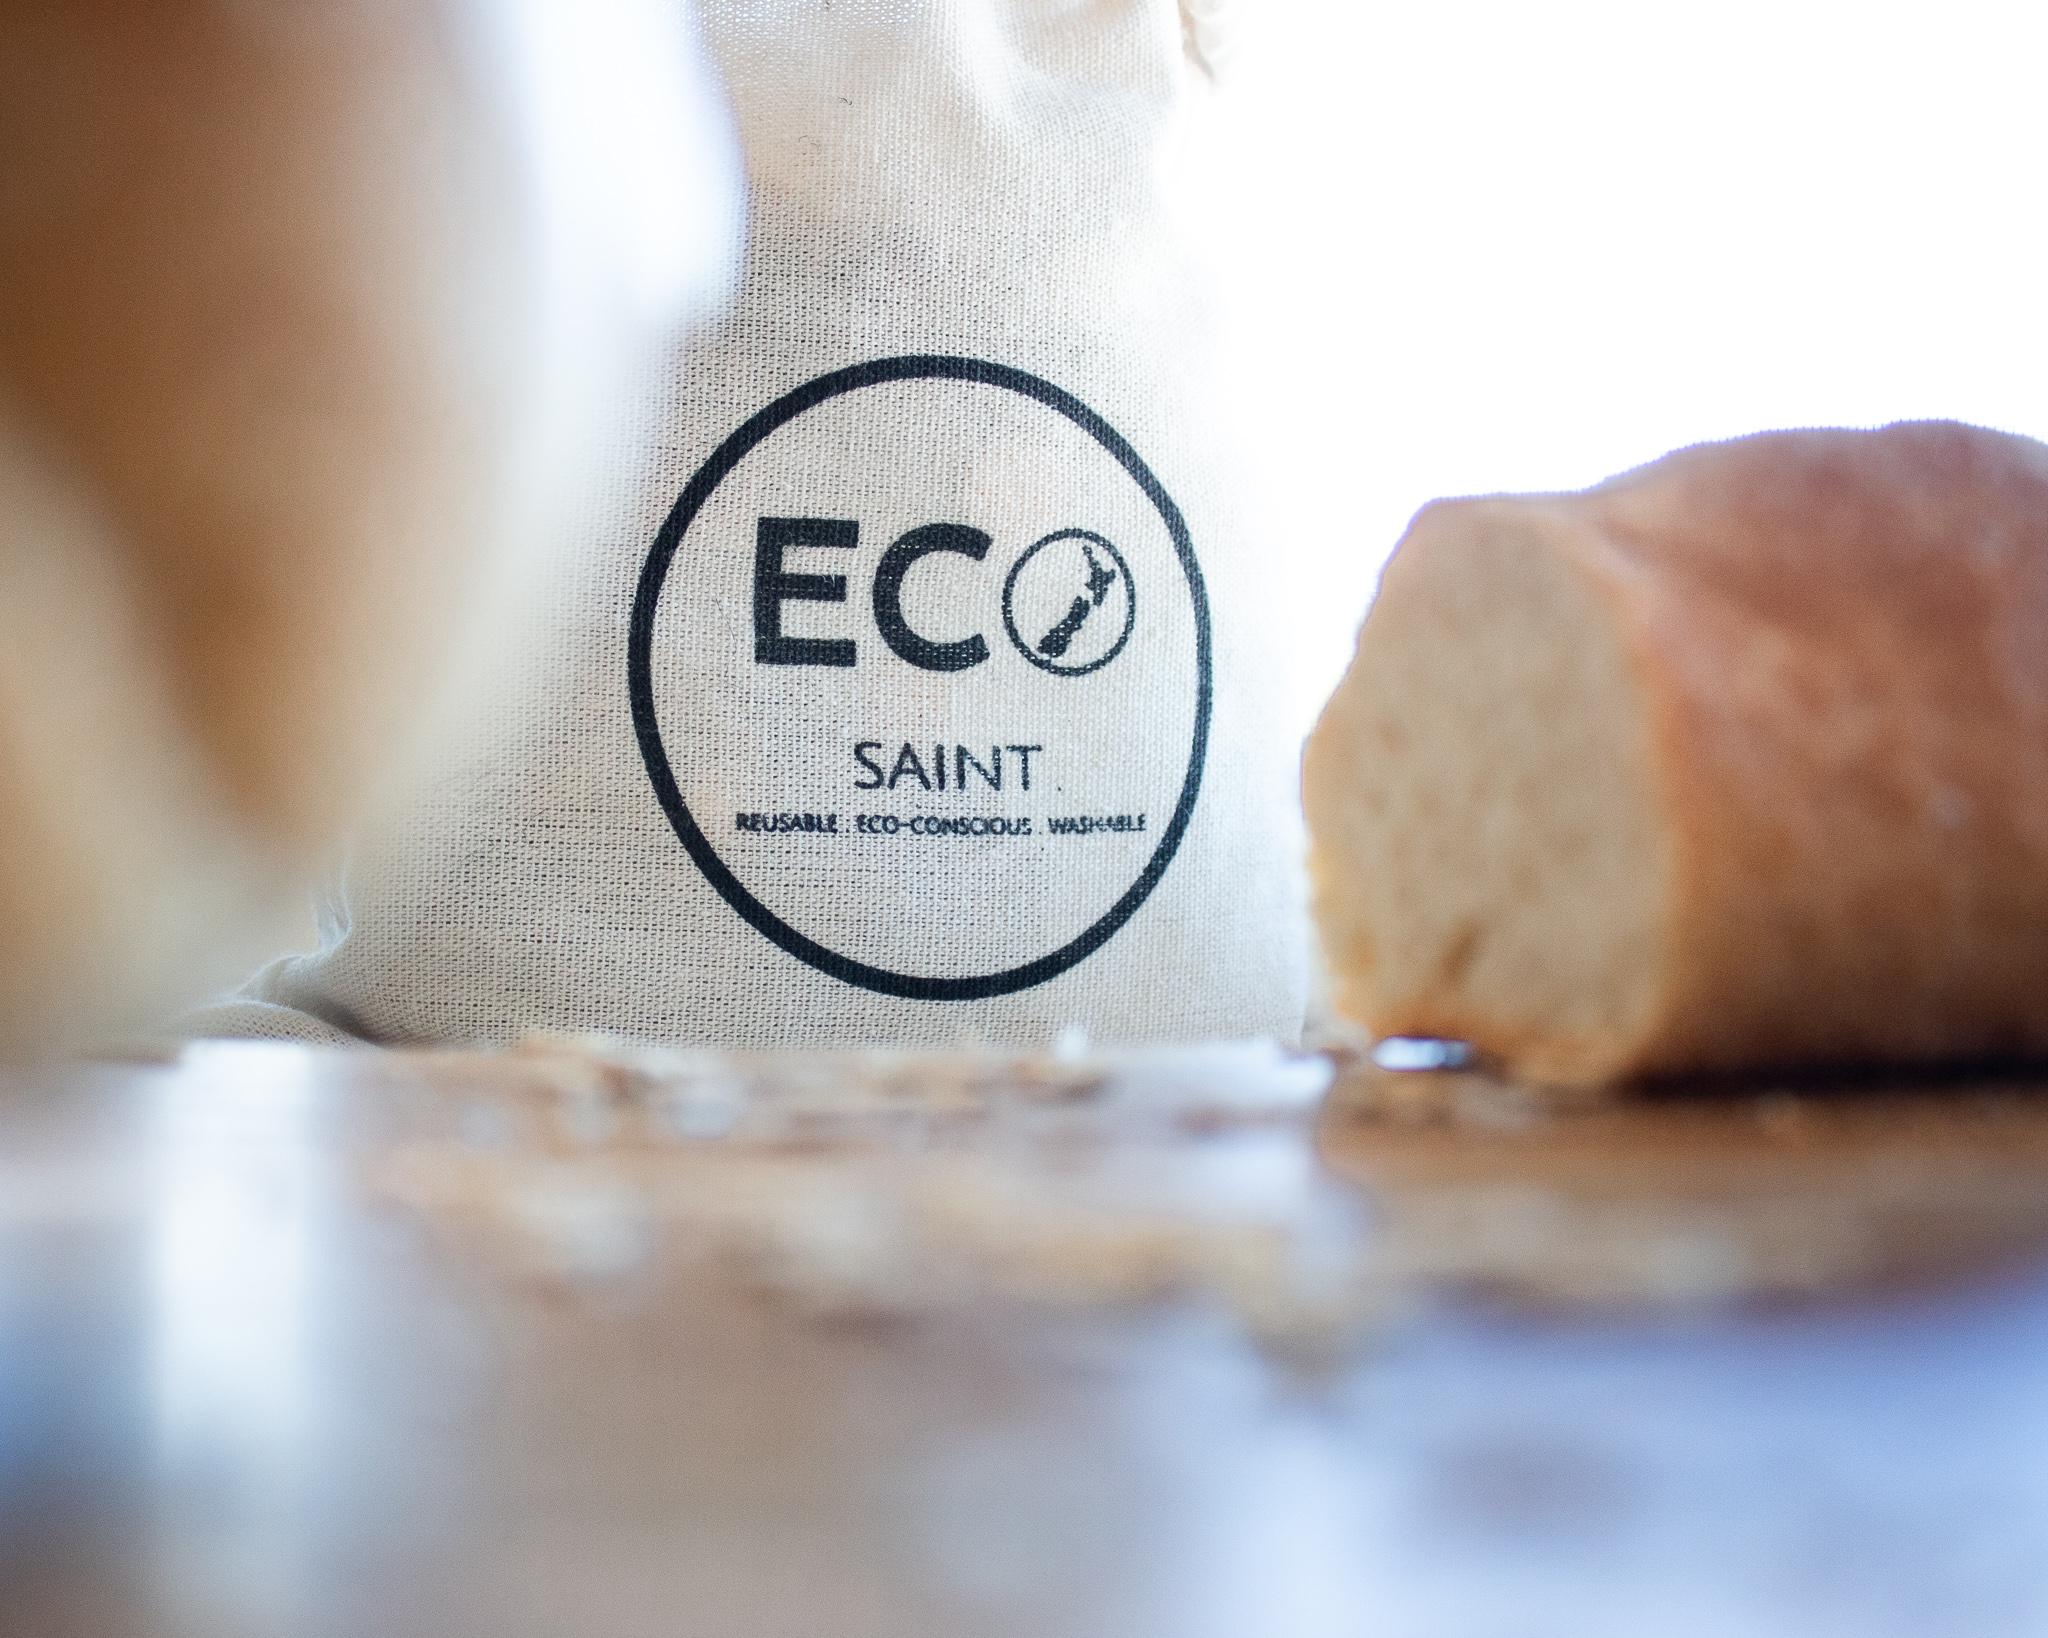 Eco Saint_15.jpg